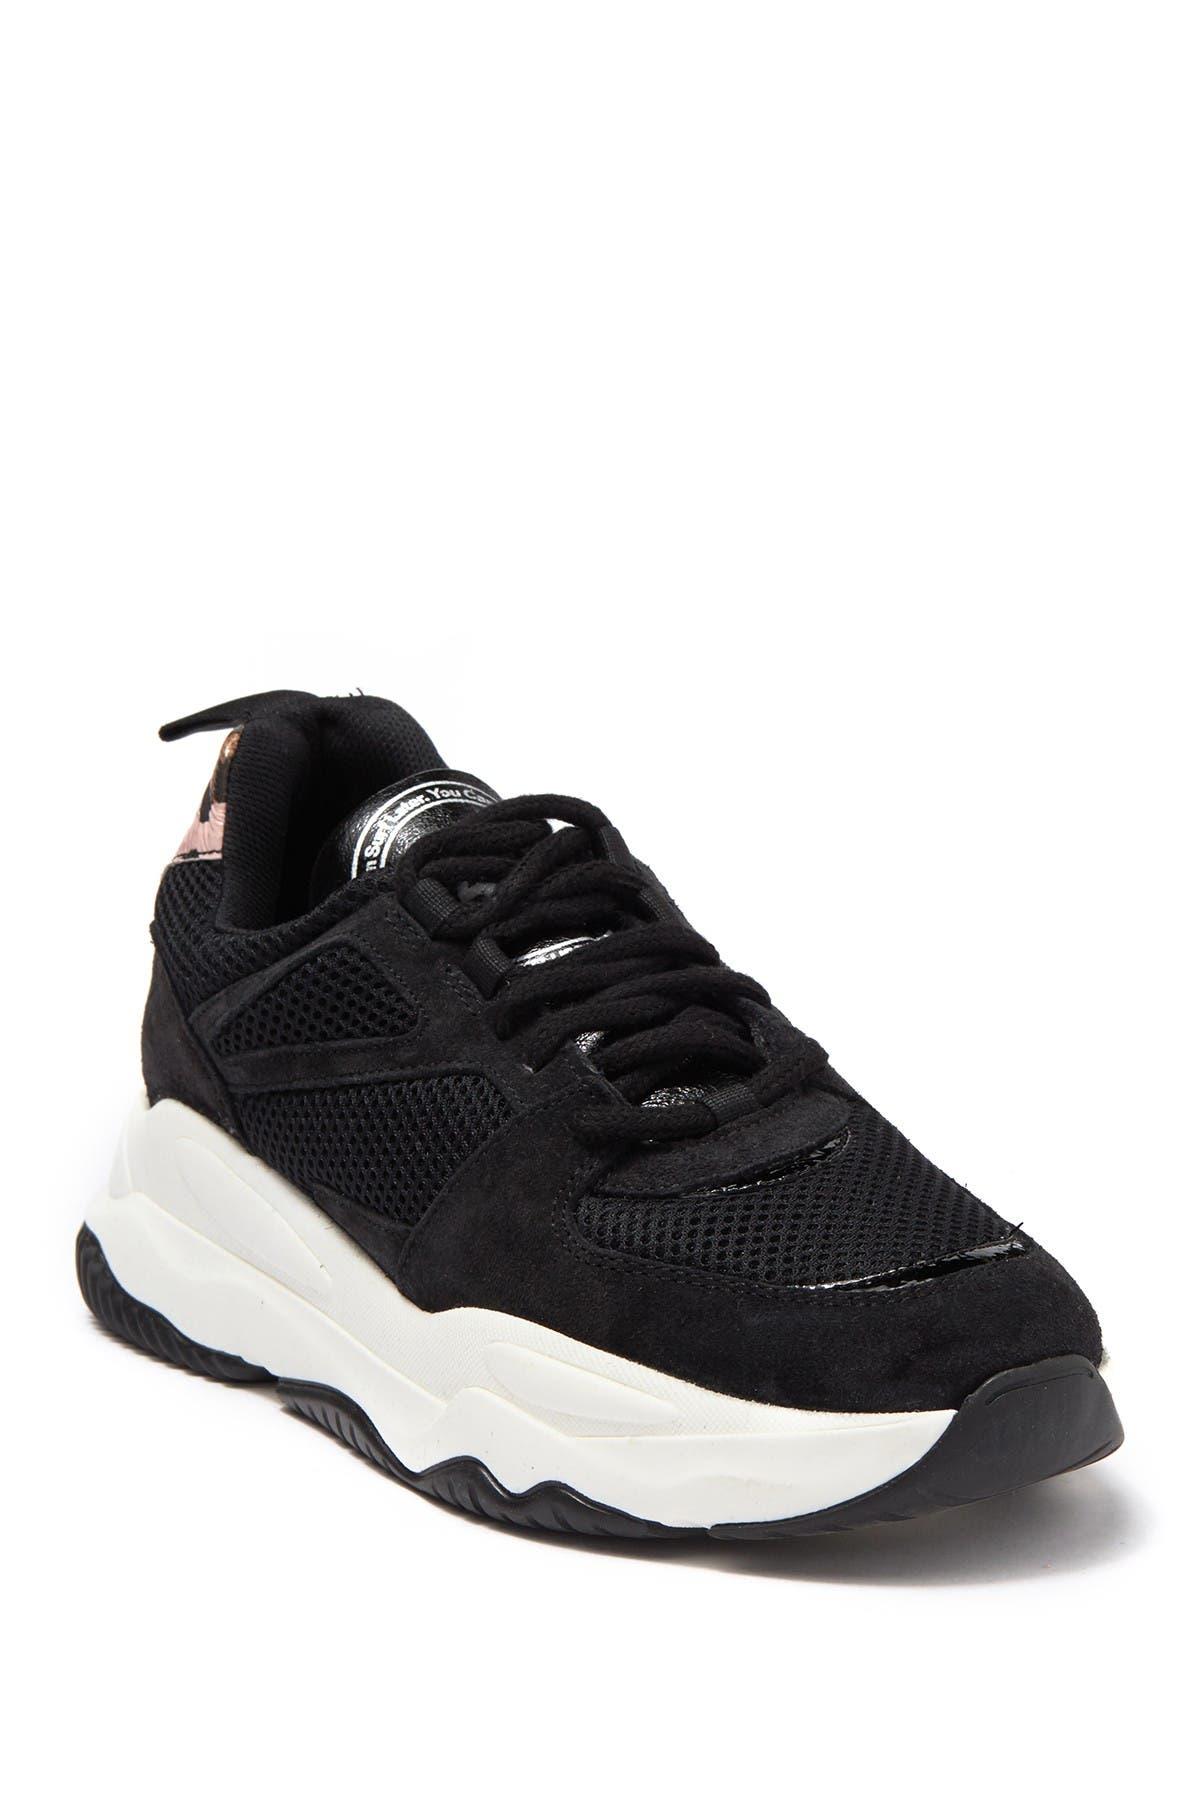 Image of P448 Luke Chunky Sole Sneaker